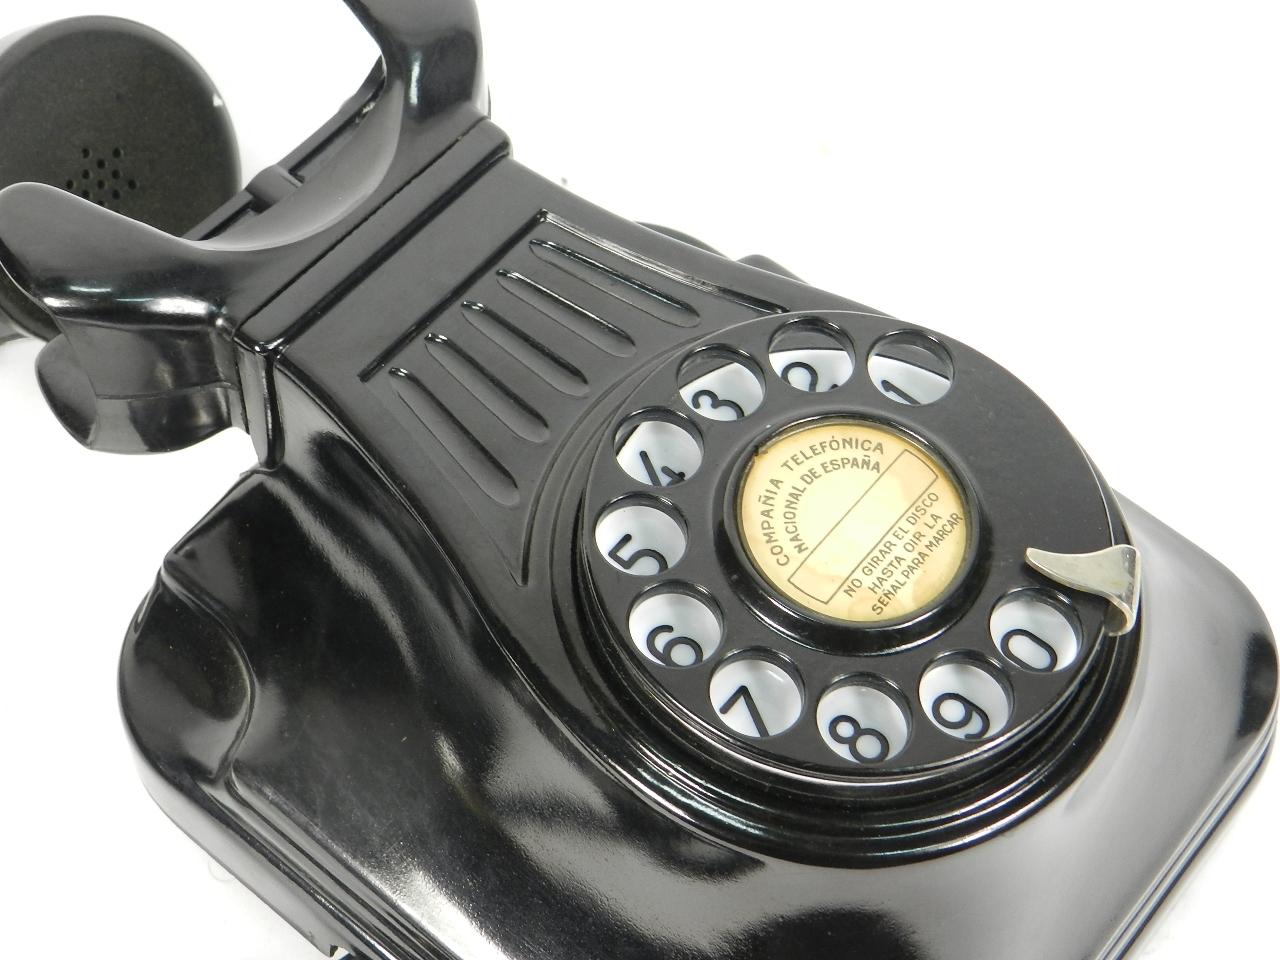 Imagen TELEFONO  STANDARD ELECTRICA  AÑO 1940 41820